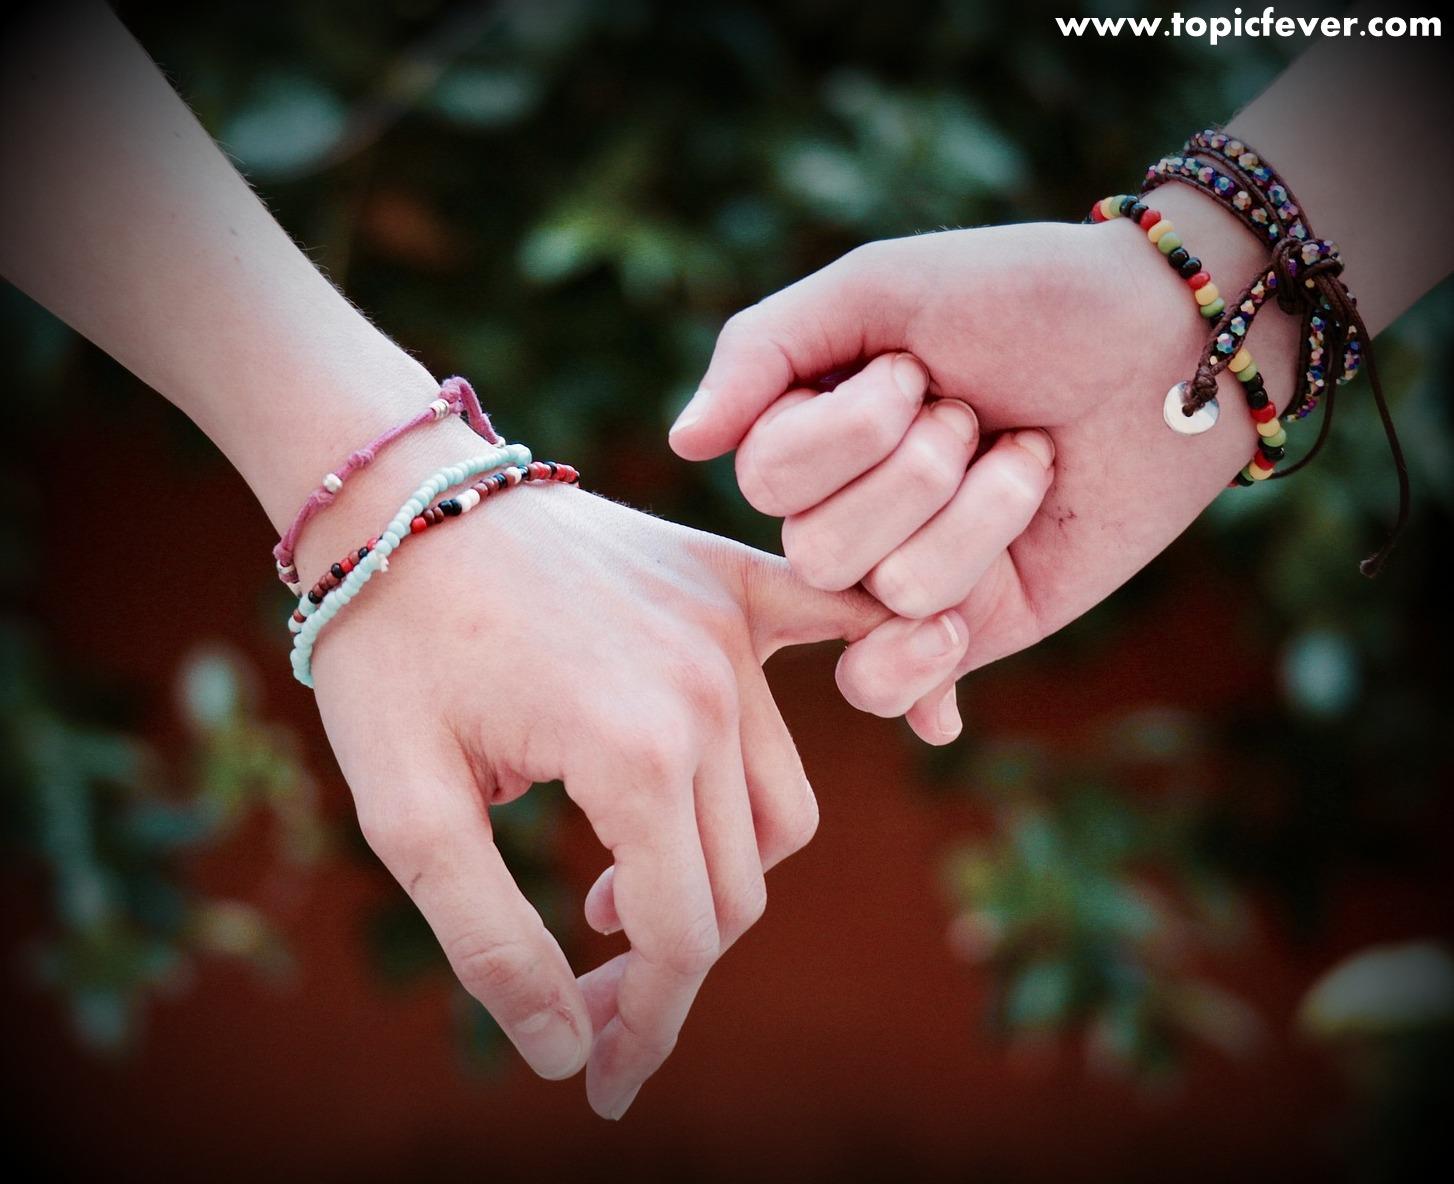 friendship quotes in hindi, best friend shayari, dosti